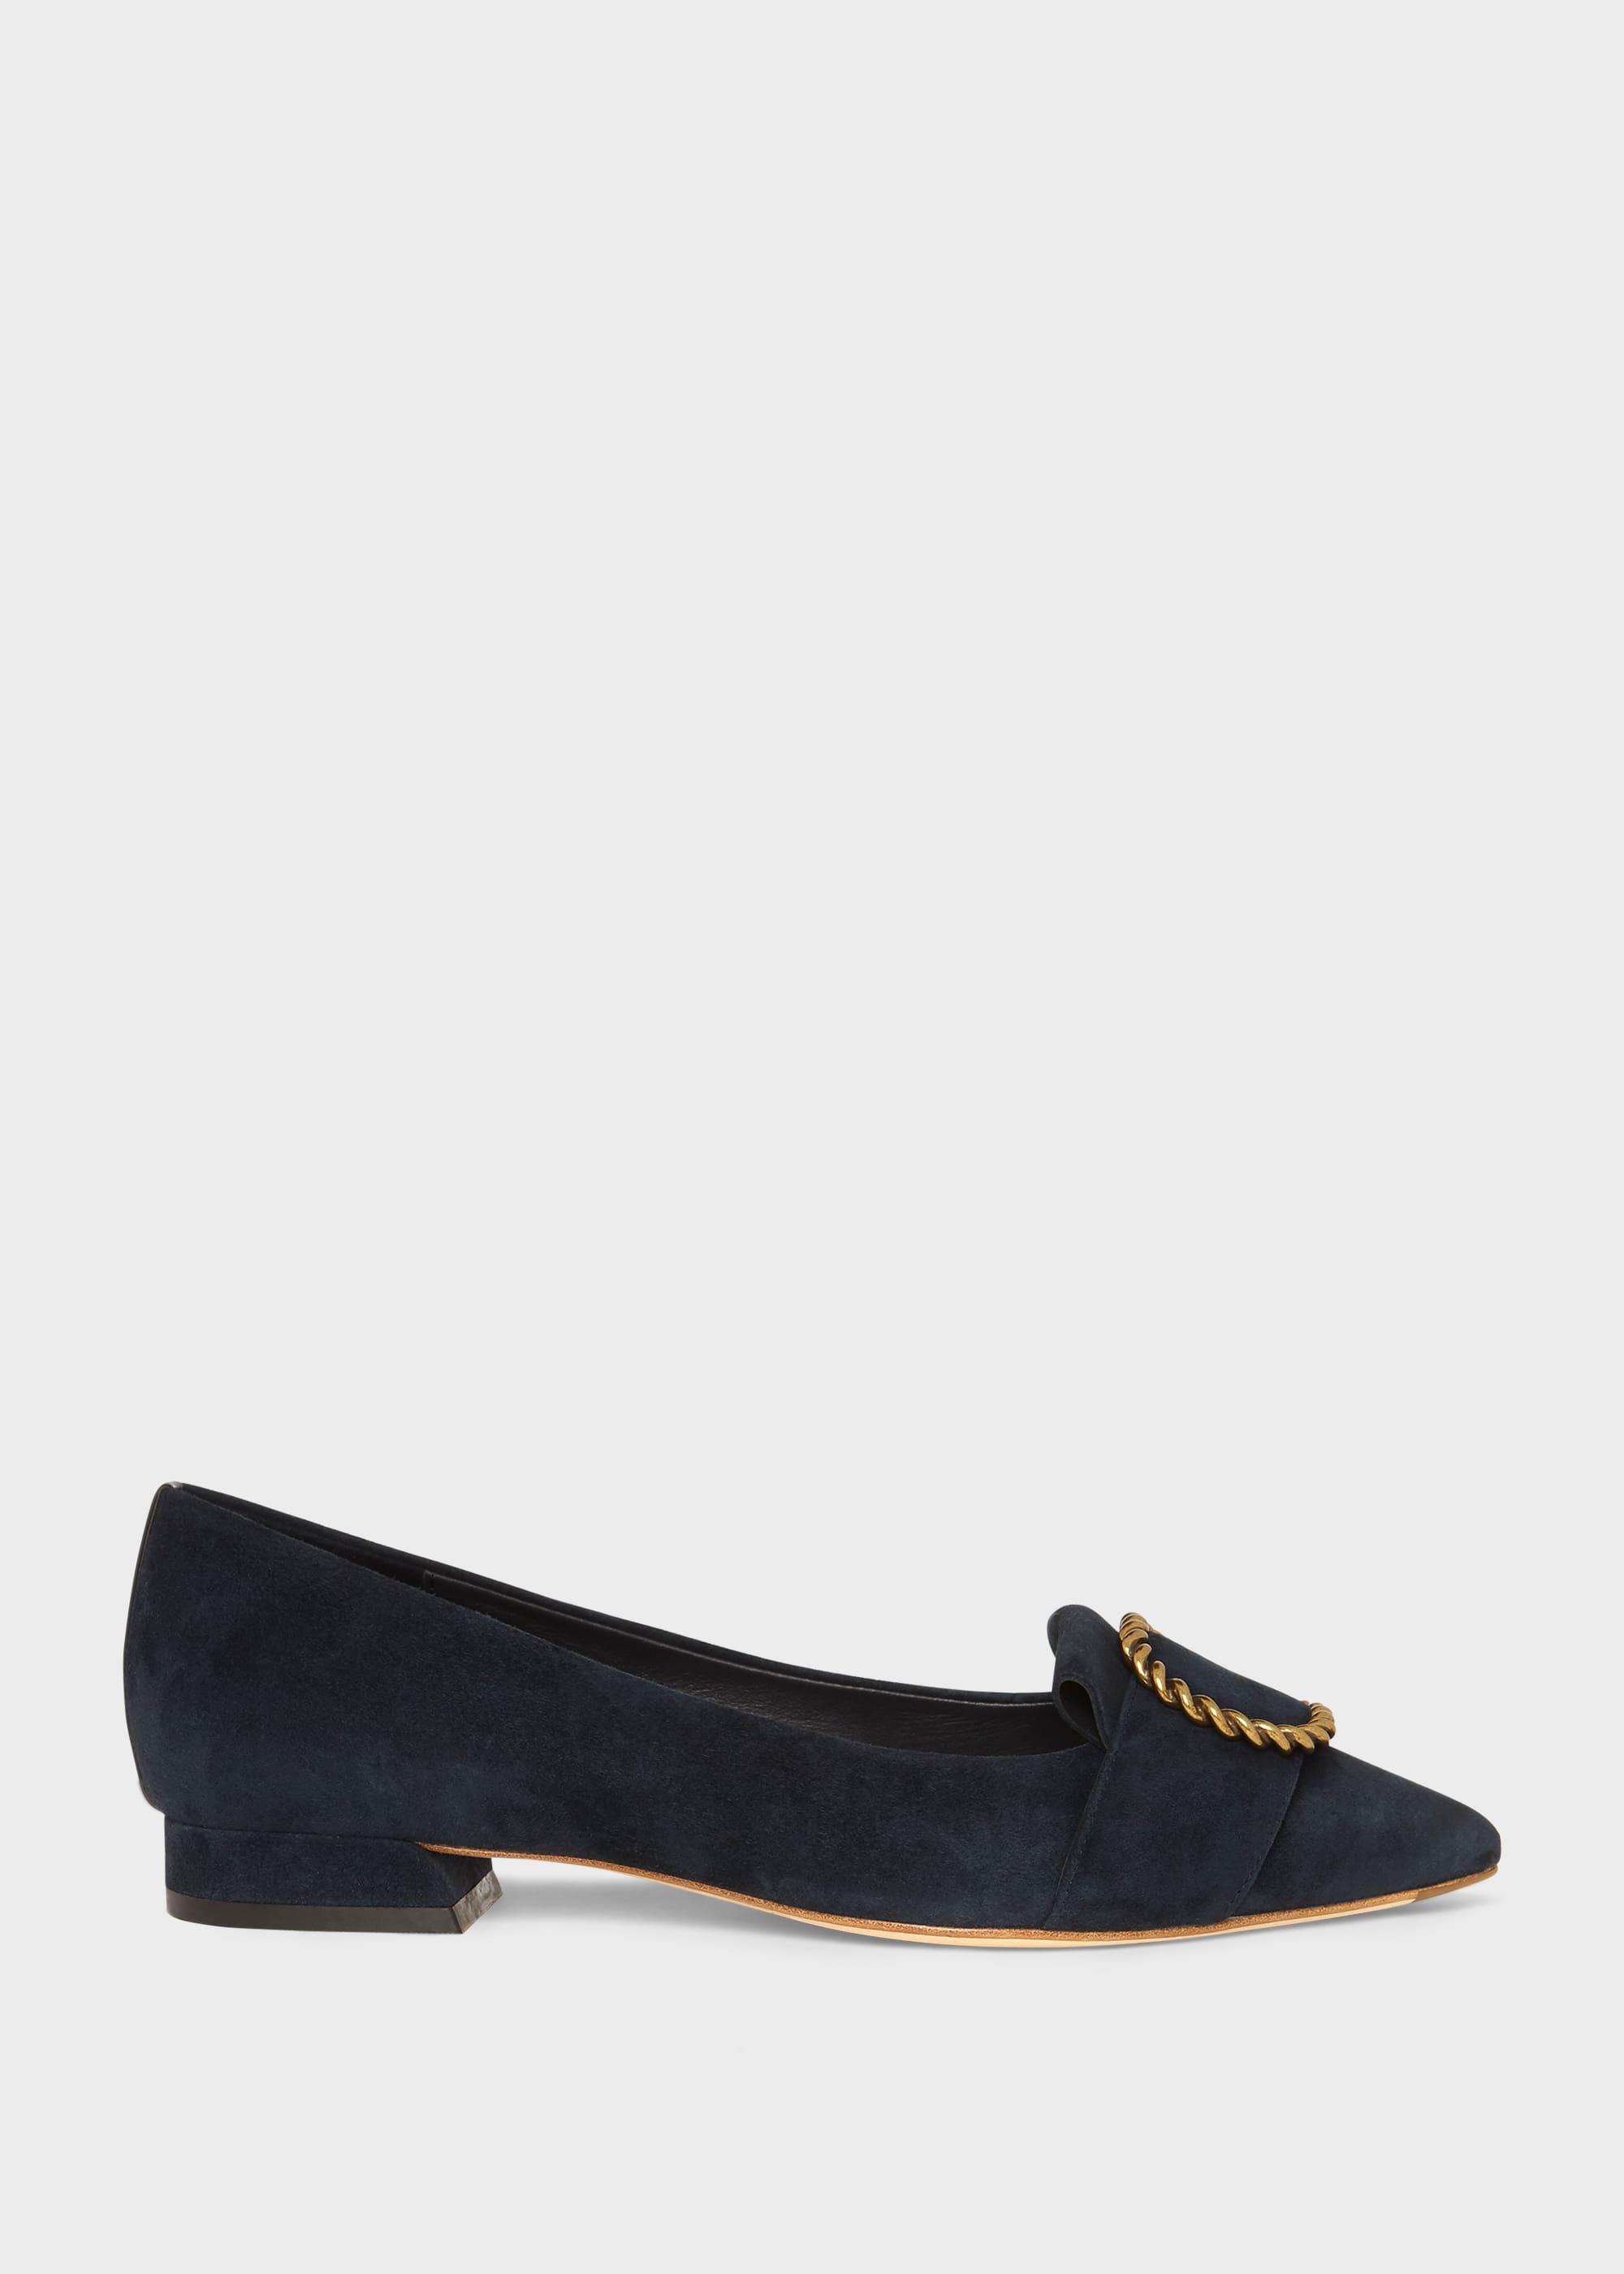 Hobbs Women Eliza Suede Flat Shoes